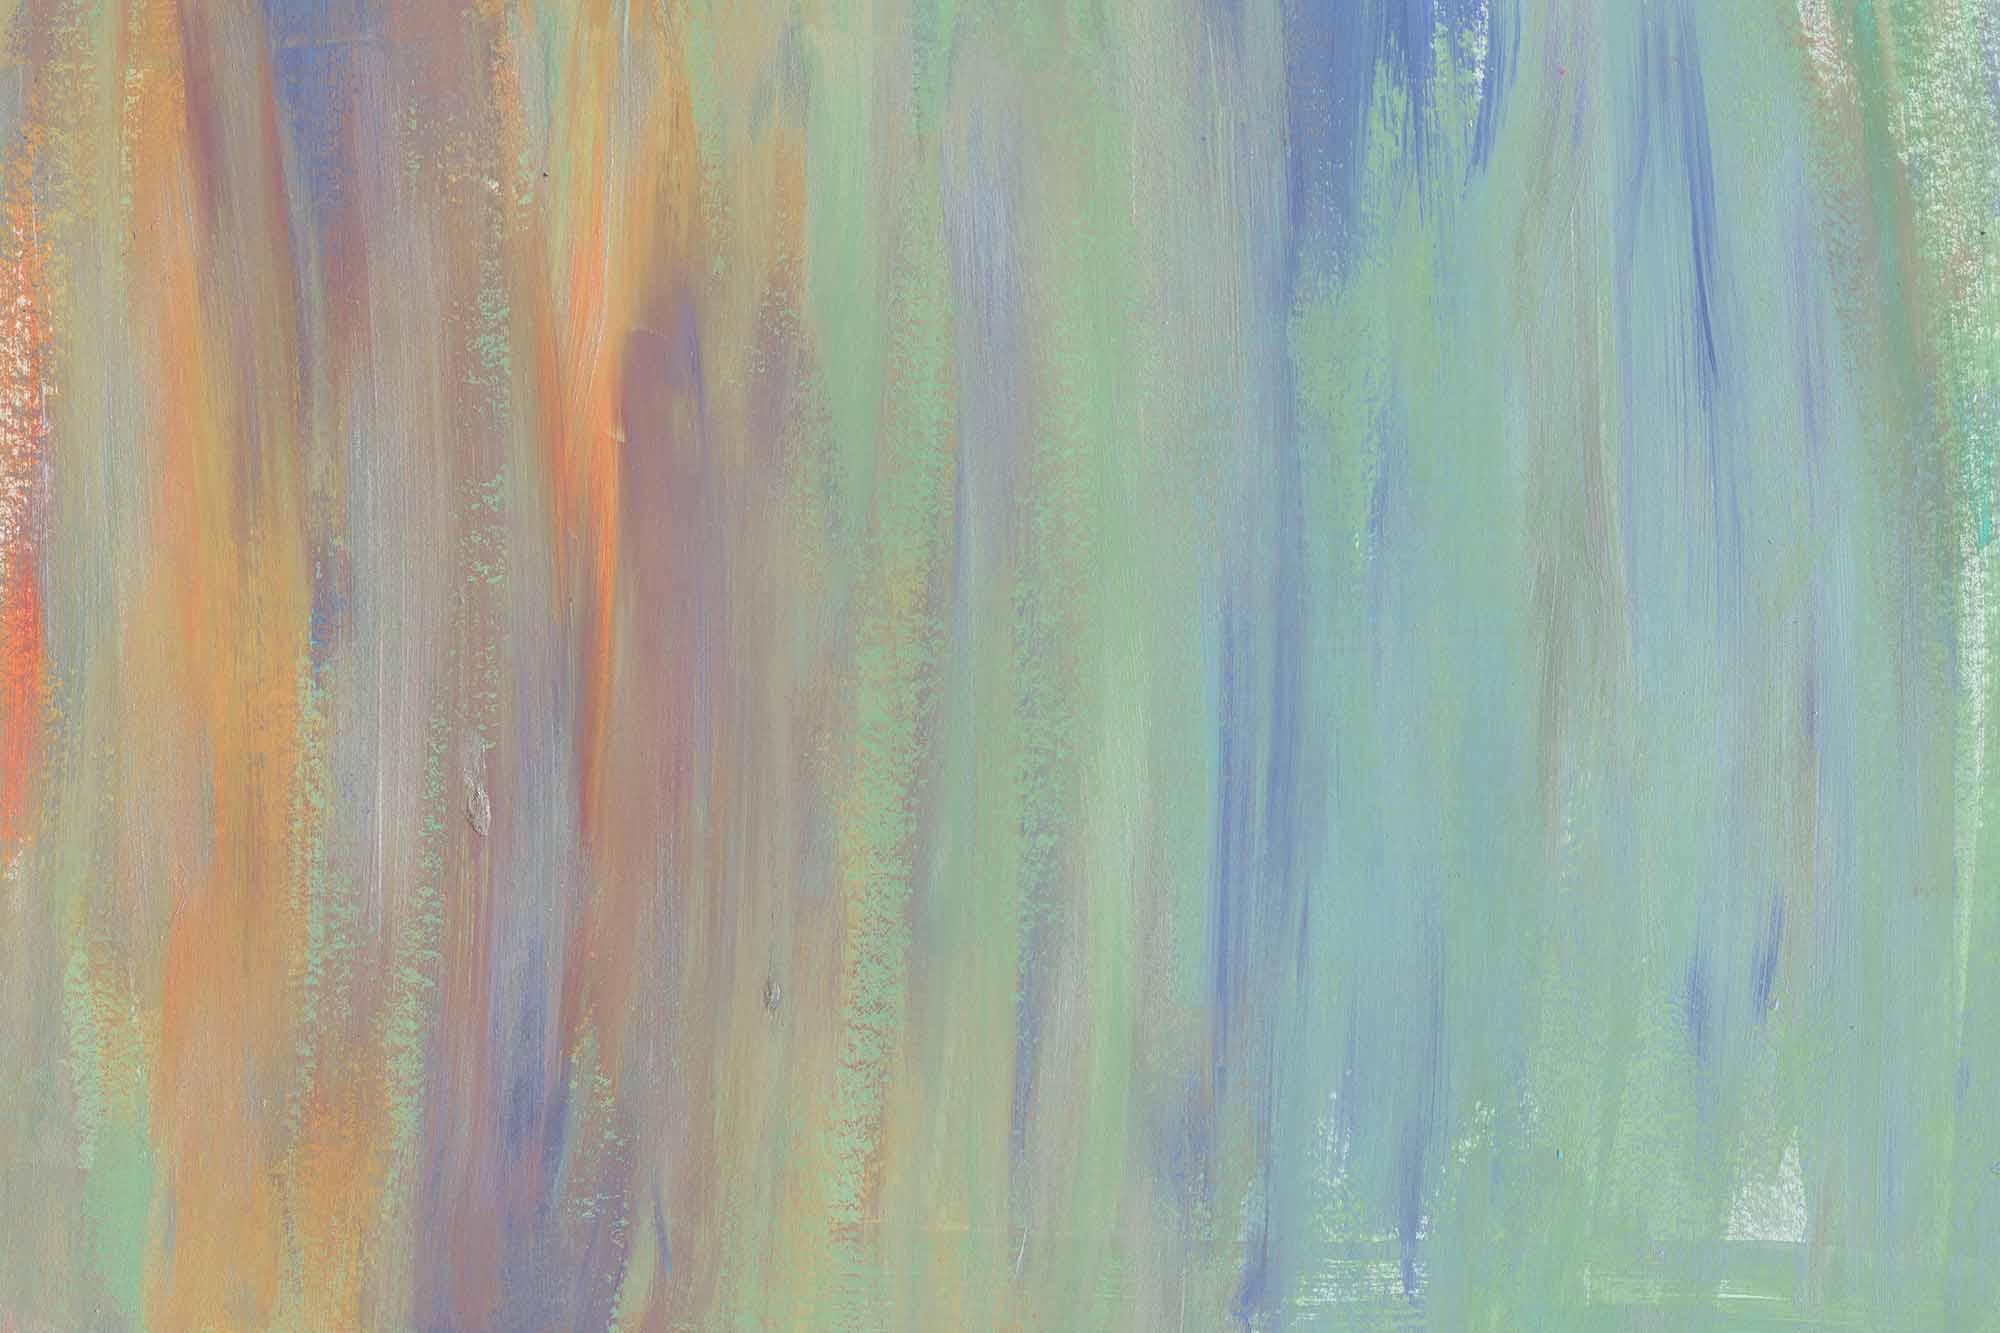 Modern Abstract Acrylic Textures 6